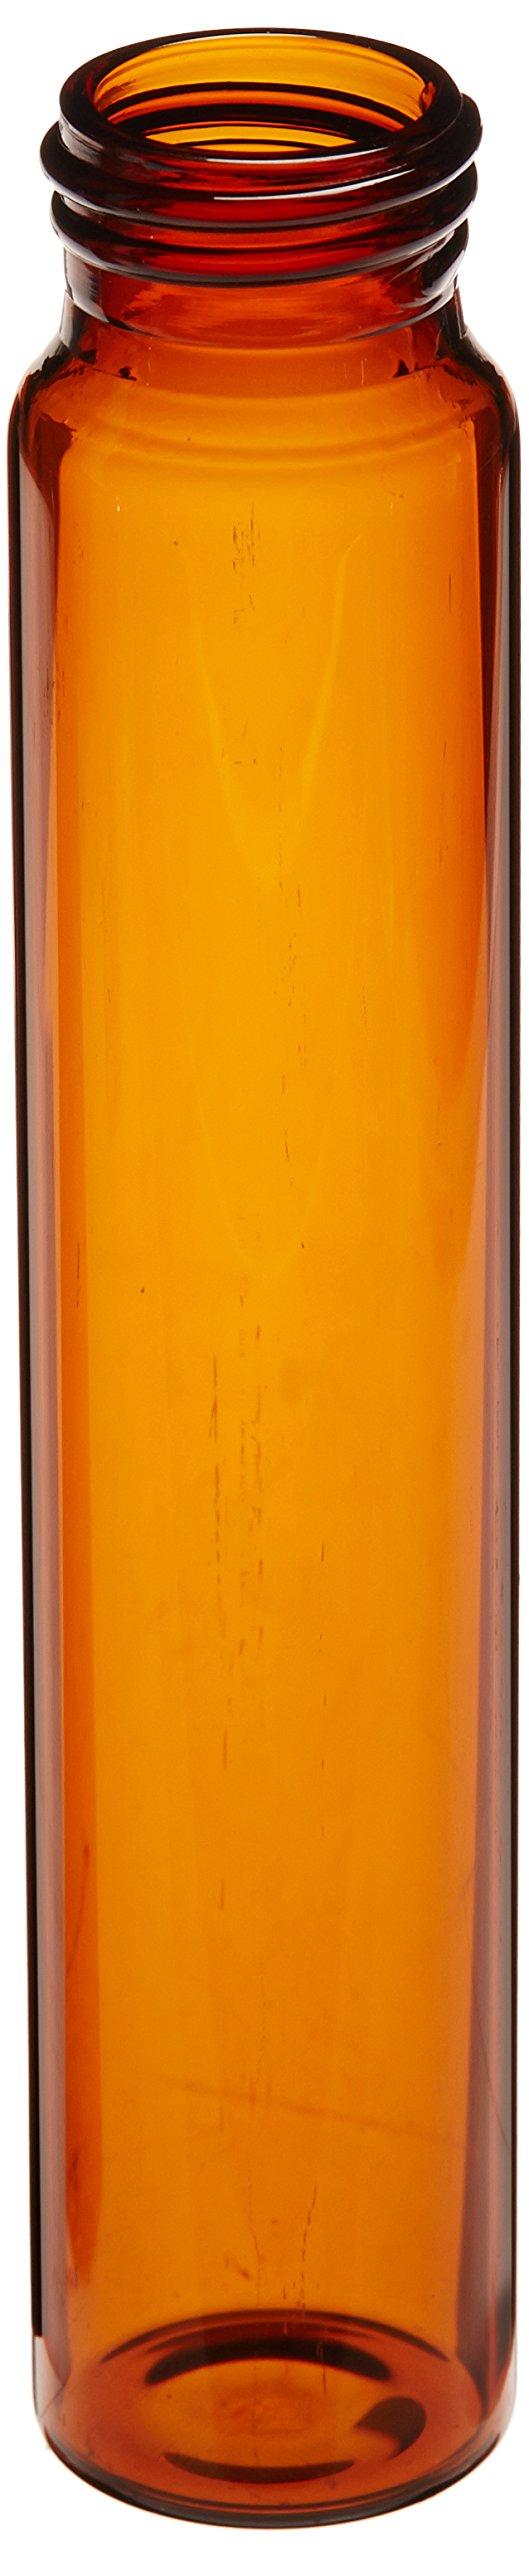 JG Finneran D0390-60 Borosilicate Glass Environmental VOA Vial, 60mL Capacity, Amber, 27mm Diameter x 140mm Length, 24-400mm Thread (Pack of 100)